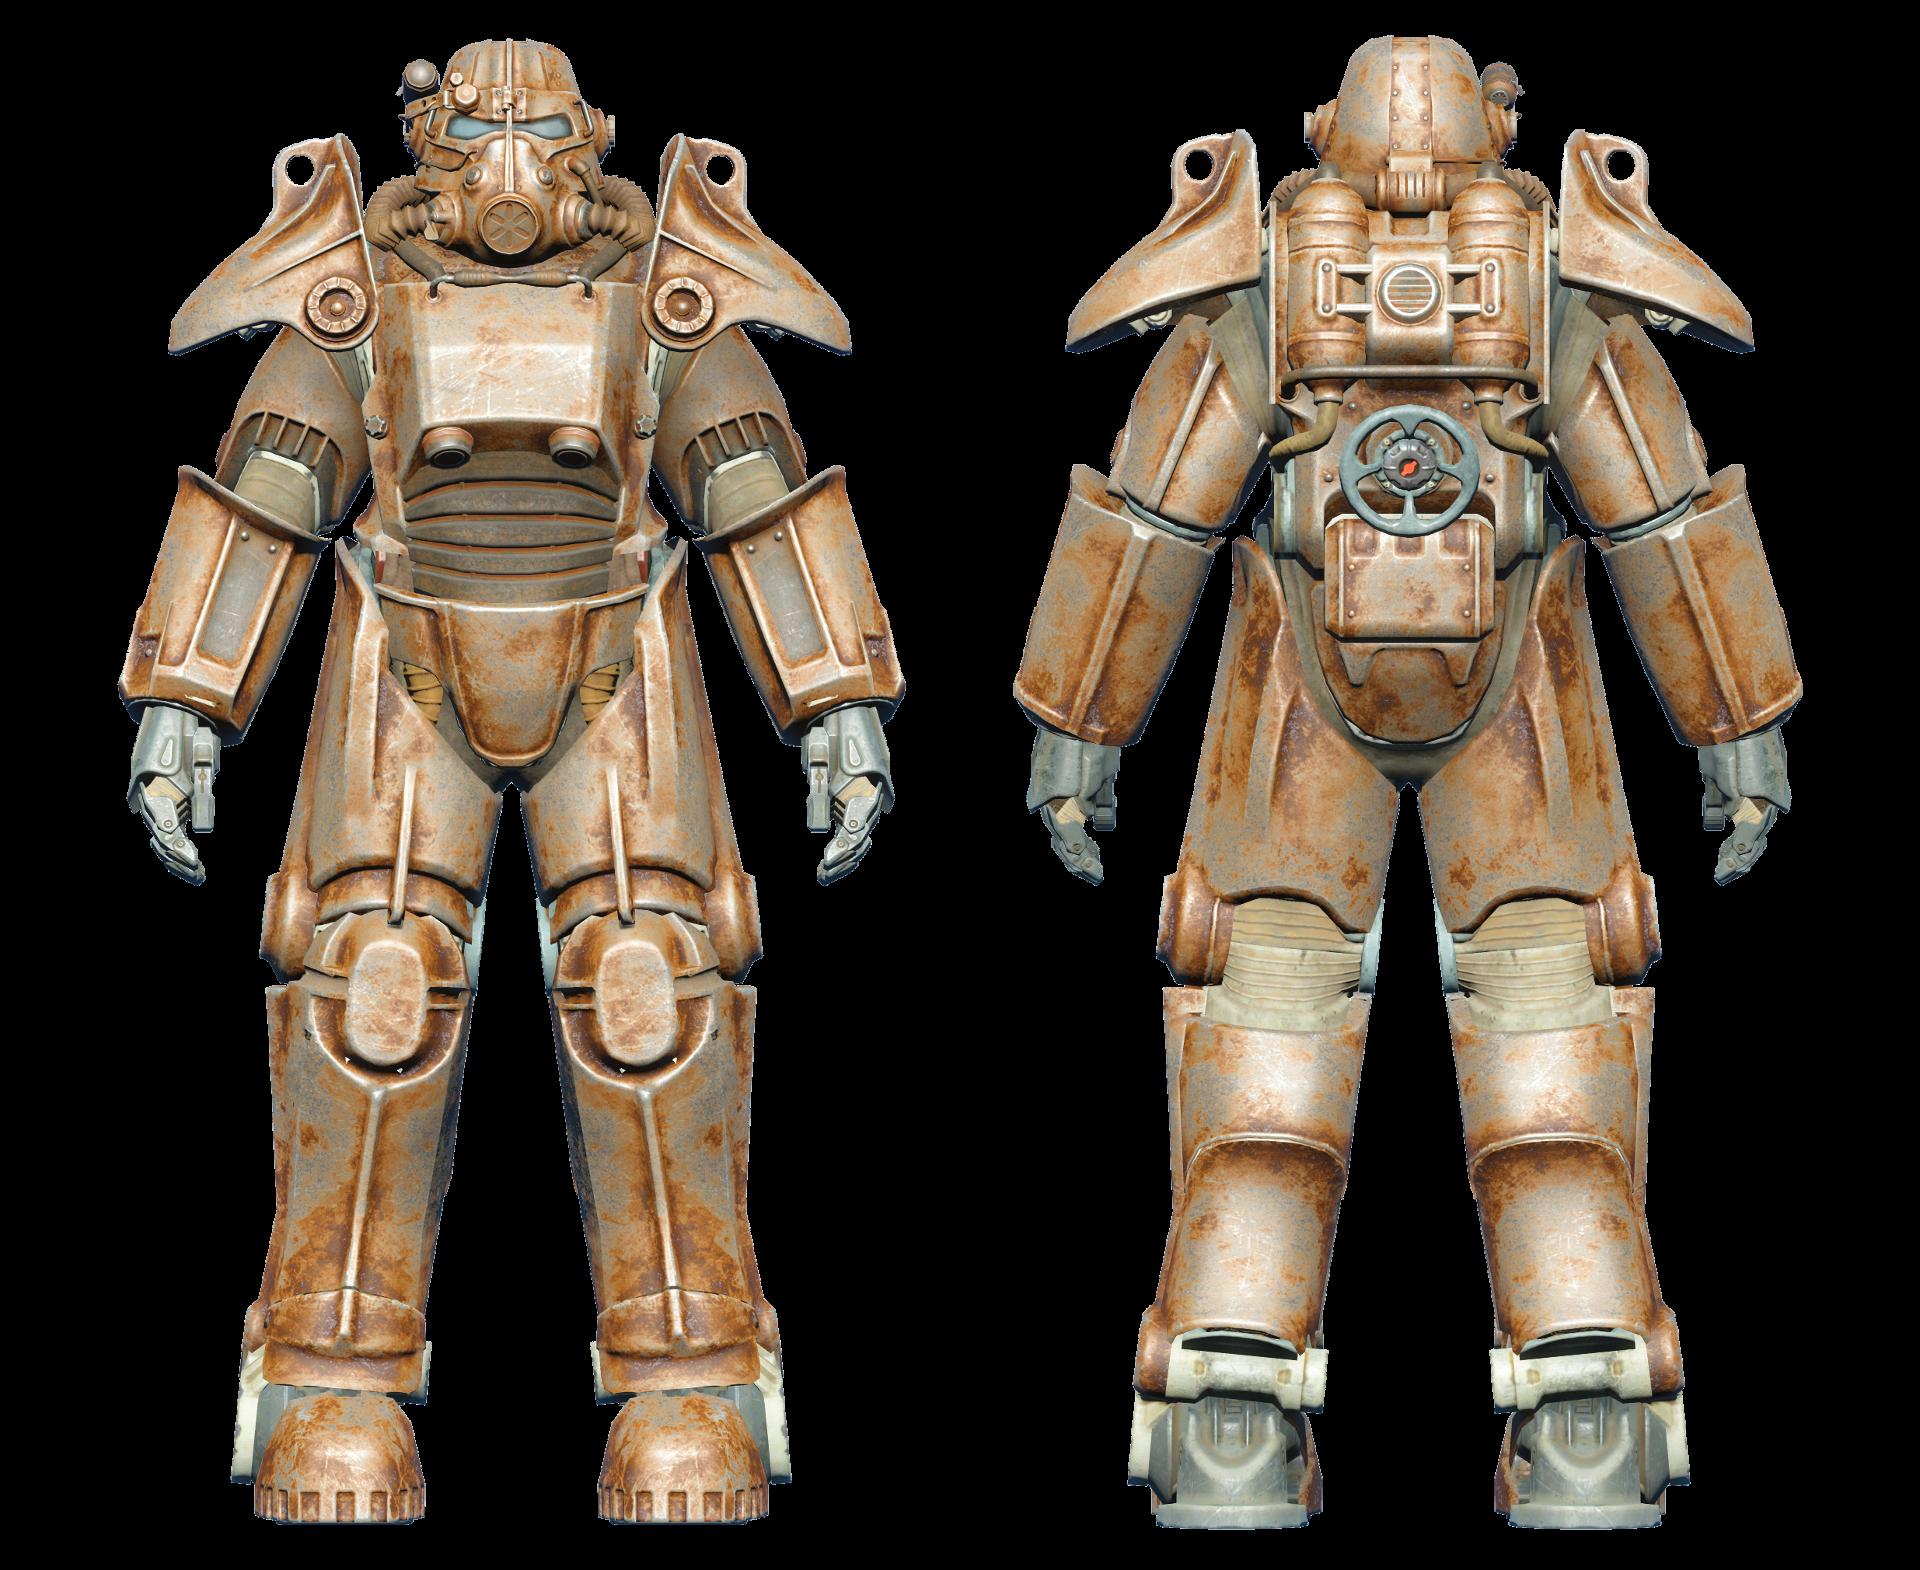 Power armor Fallout 4 Fallout Wiki FANDOM powered by Wikia